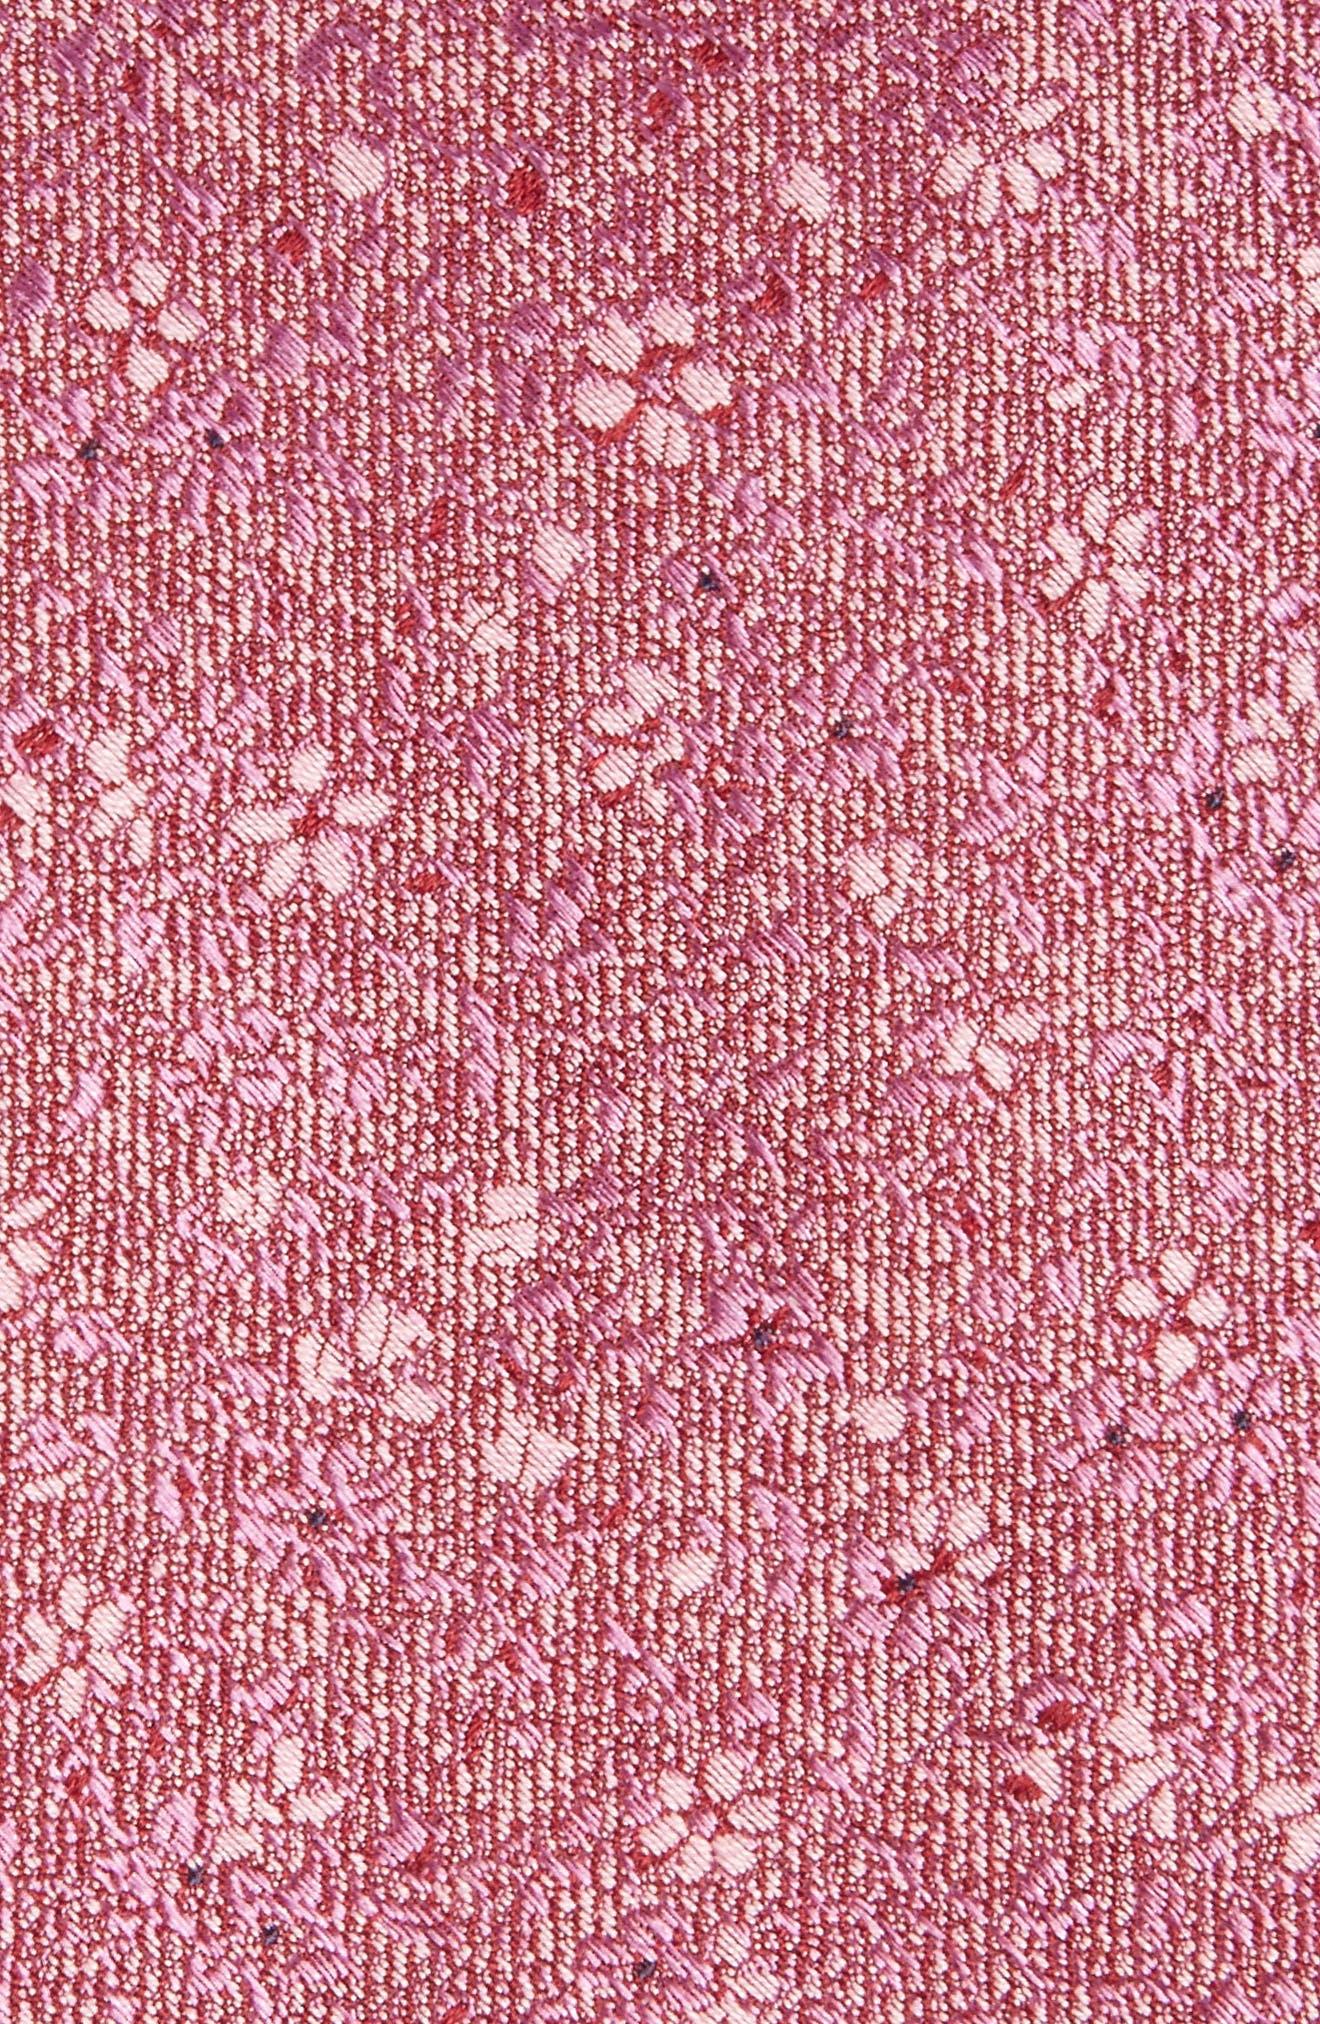 Alternate Image 2  - Calibrate Lindsay Floral Print Silk & Cotton Tie